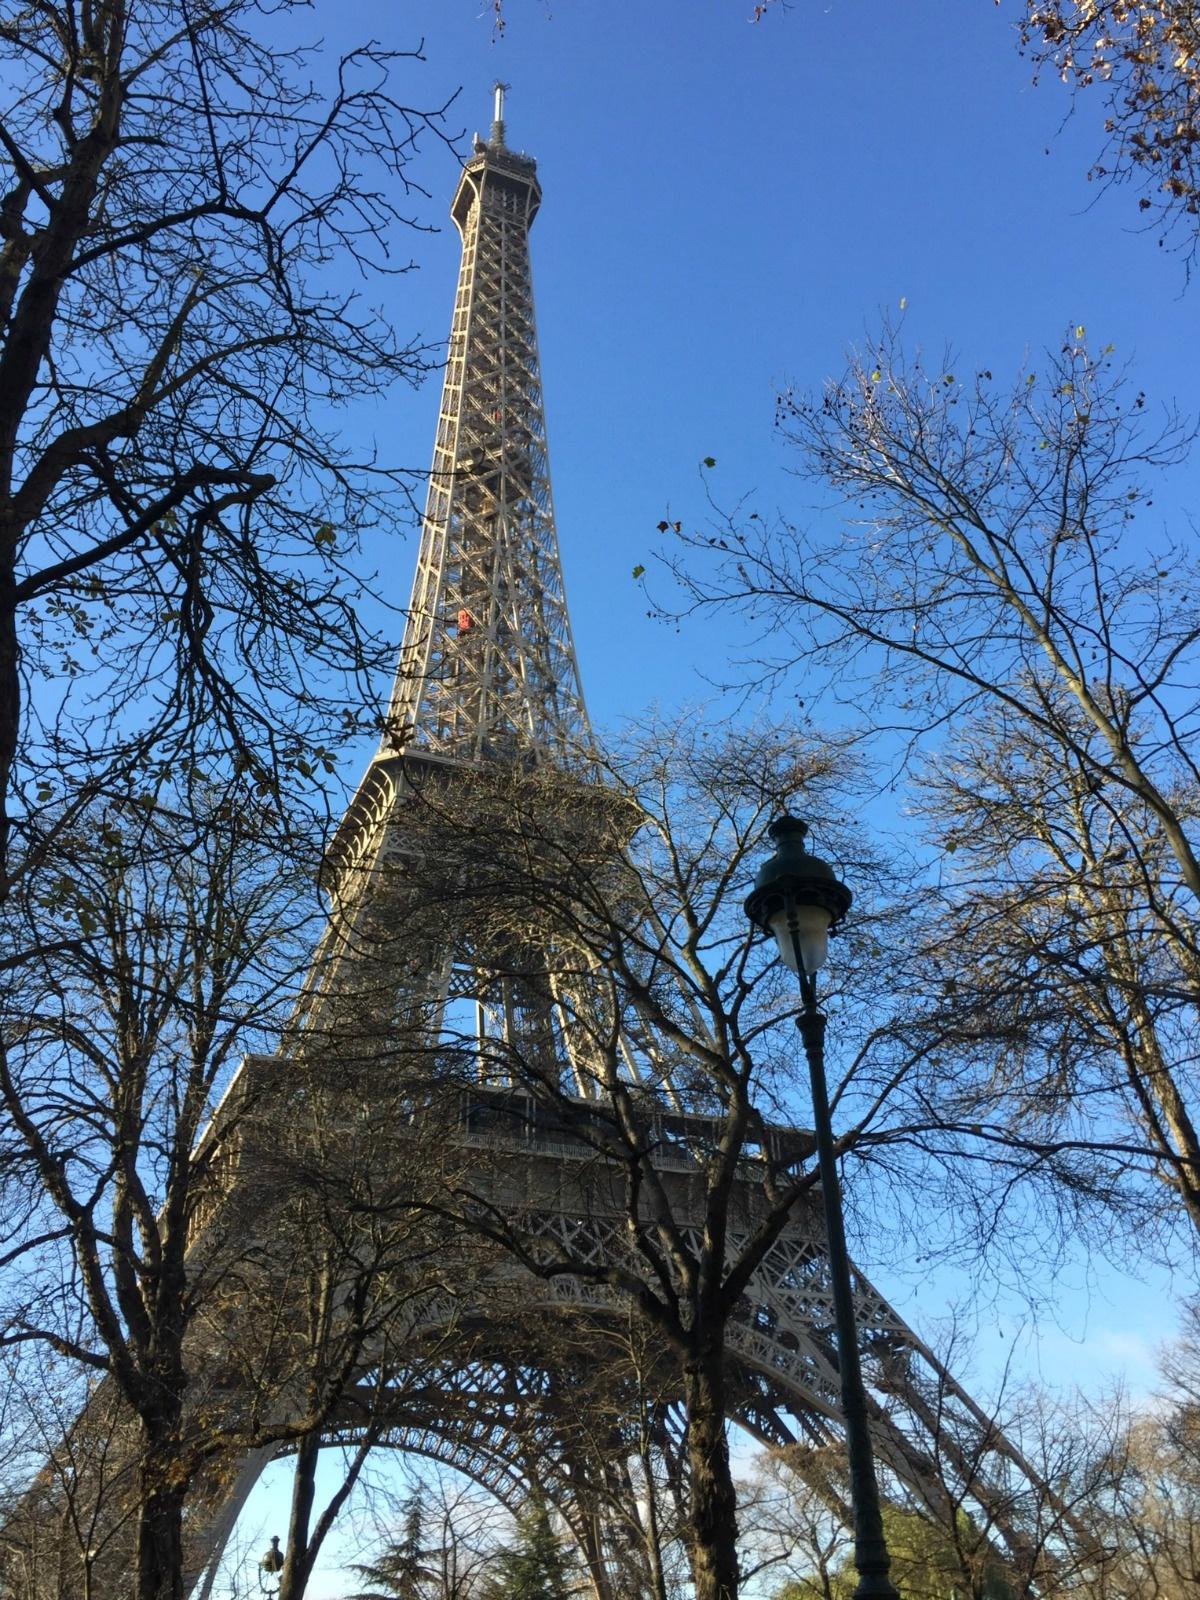 the iconic Eiffel Tower, Paris